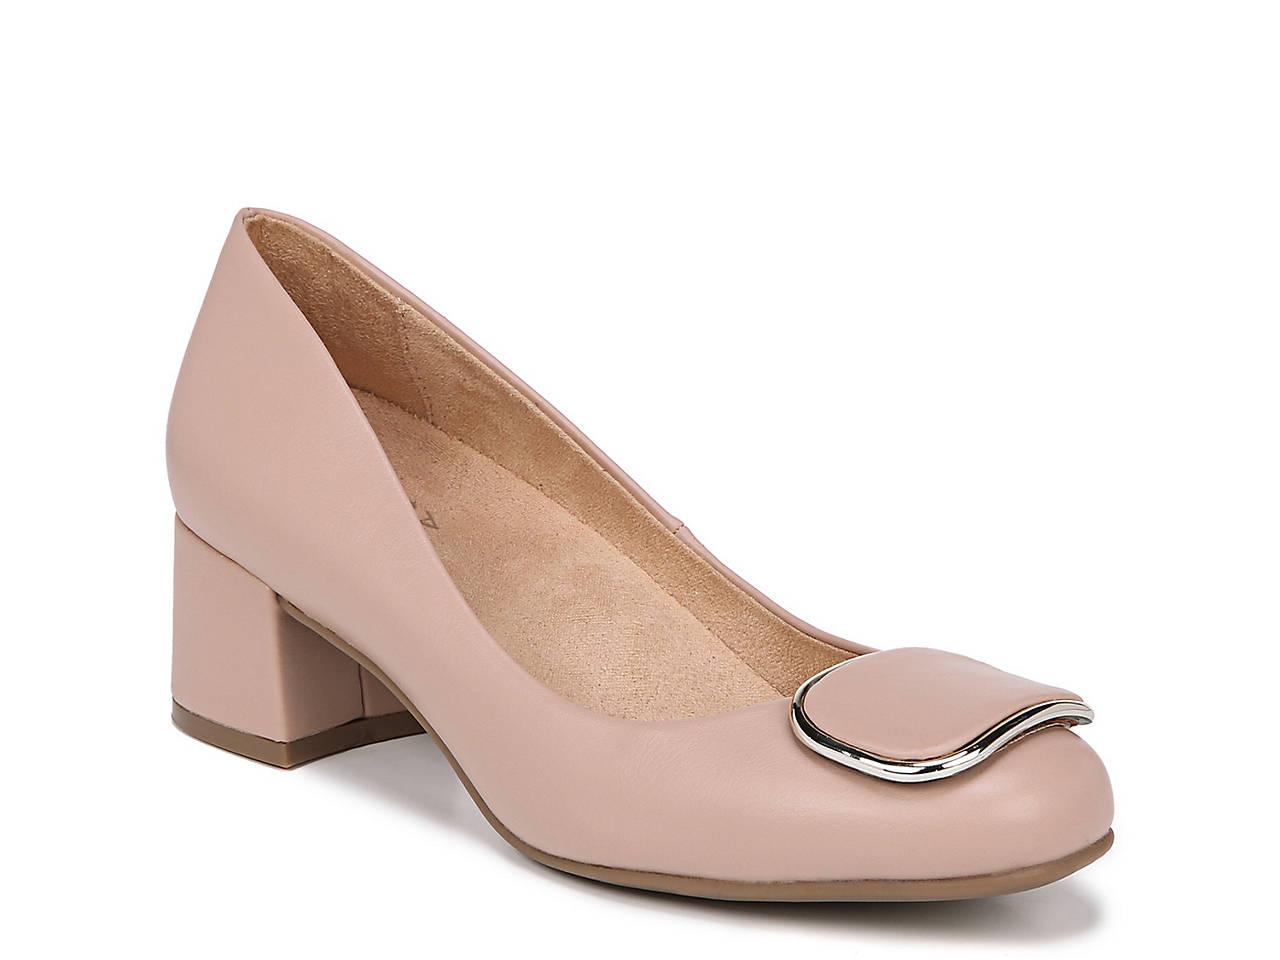 374aba25c651 Naturalizer Donley Pump Women s Shoes